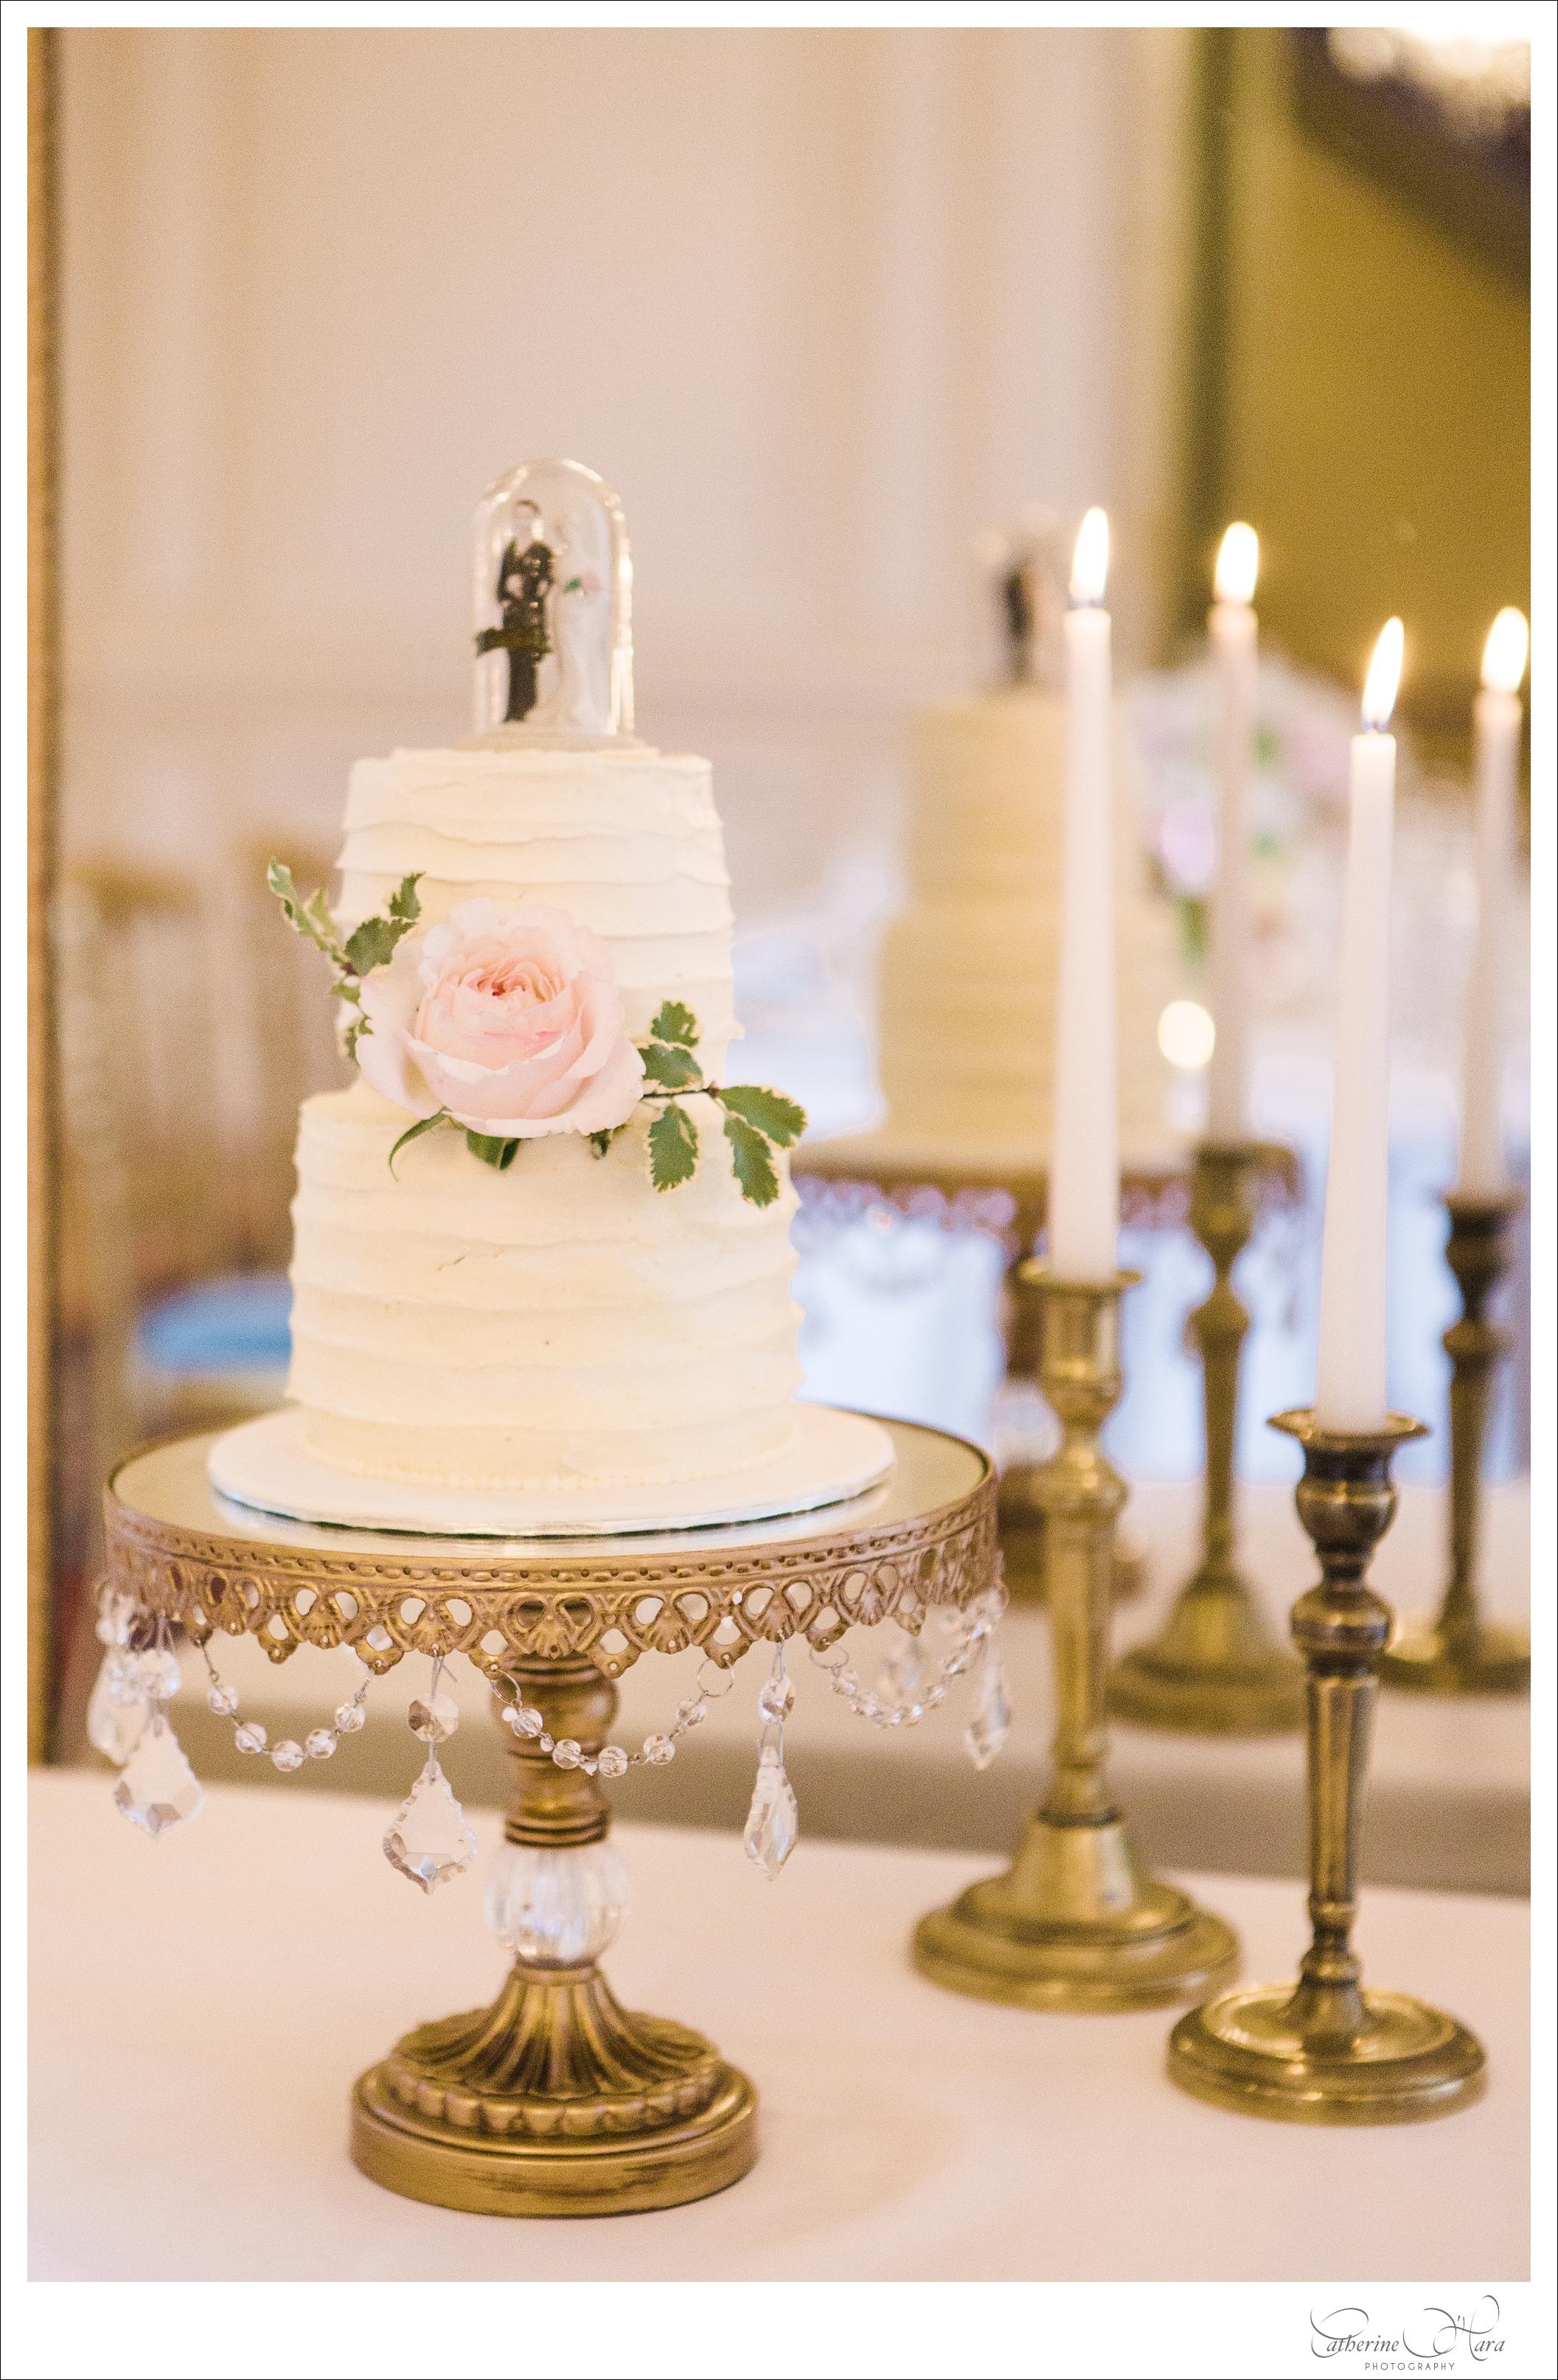 opulent treasures chandelier ball base cake stand paris wedding.jpg